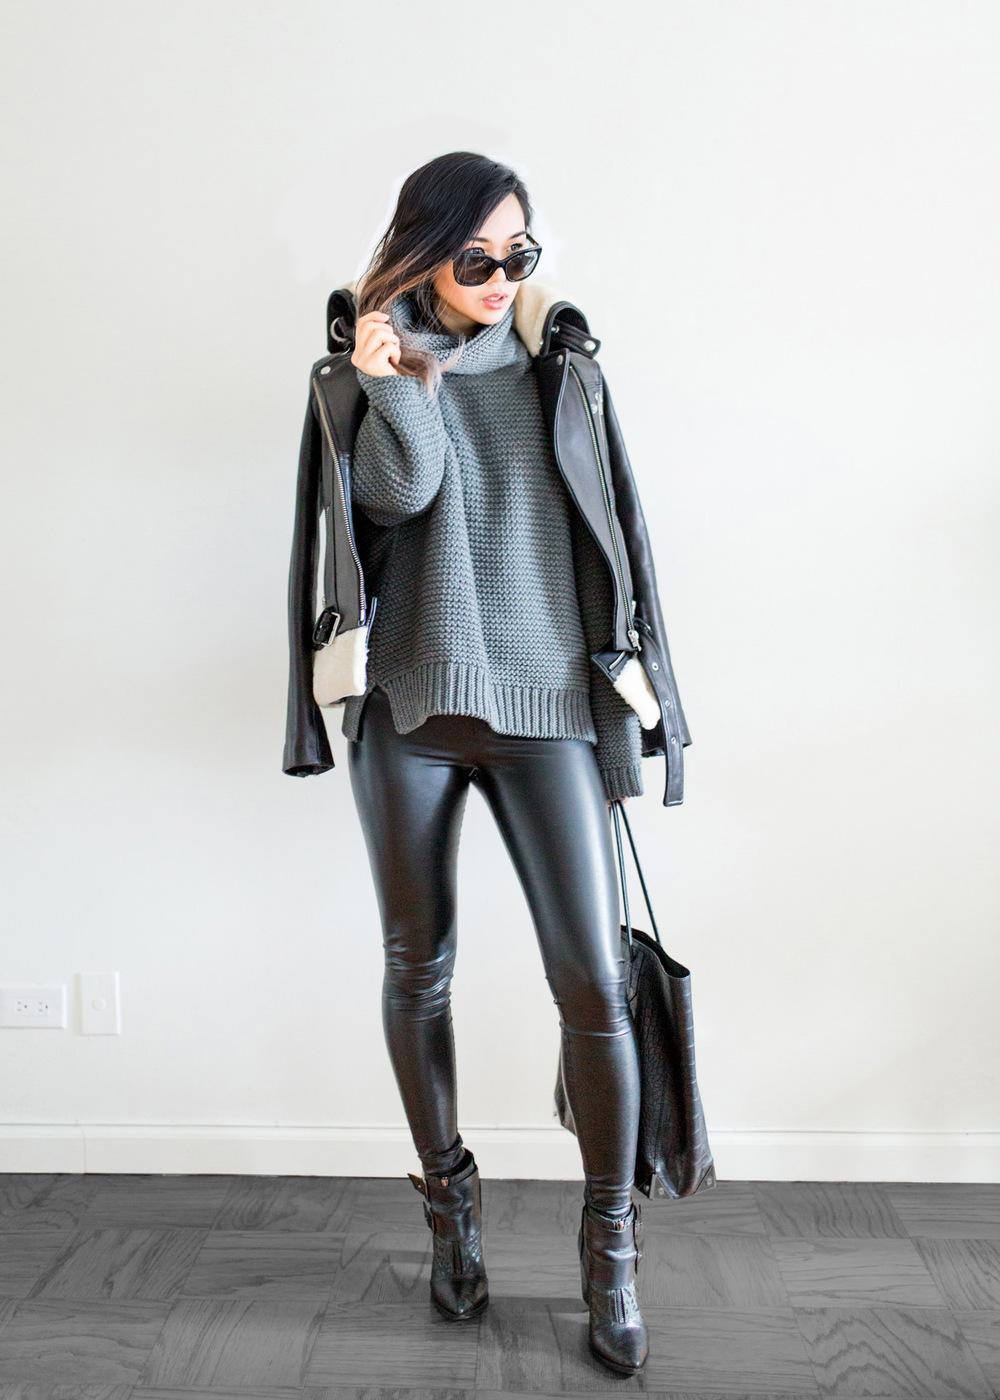 cocotrish_patriciachang_sokophotos_outfit_iro_6